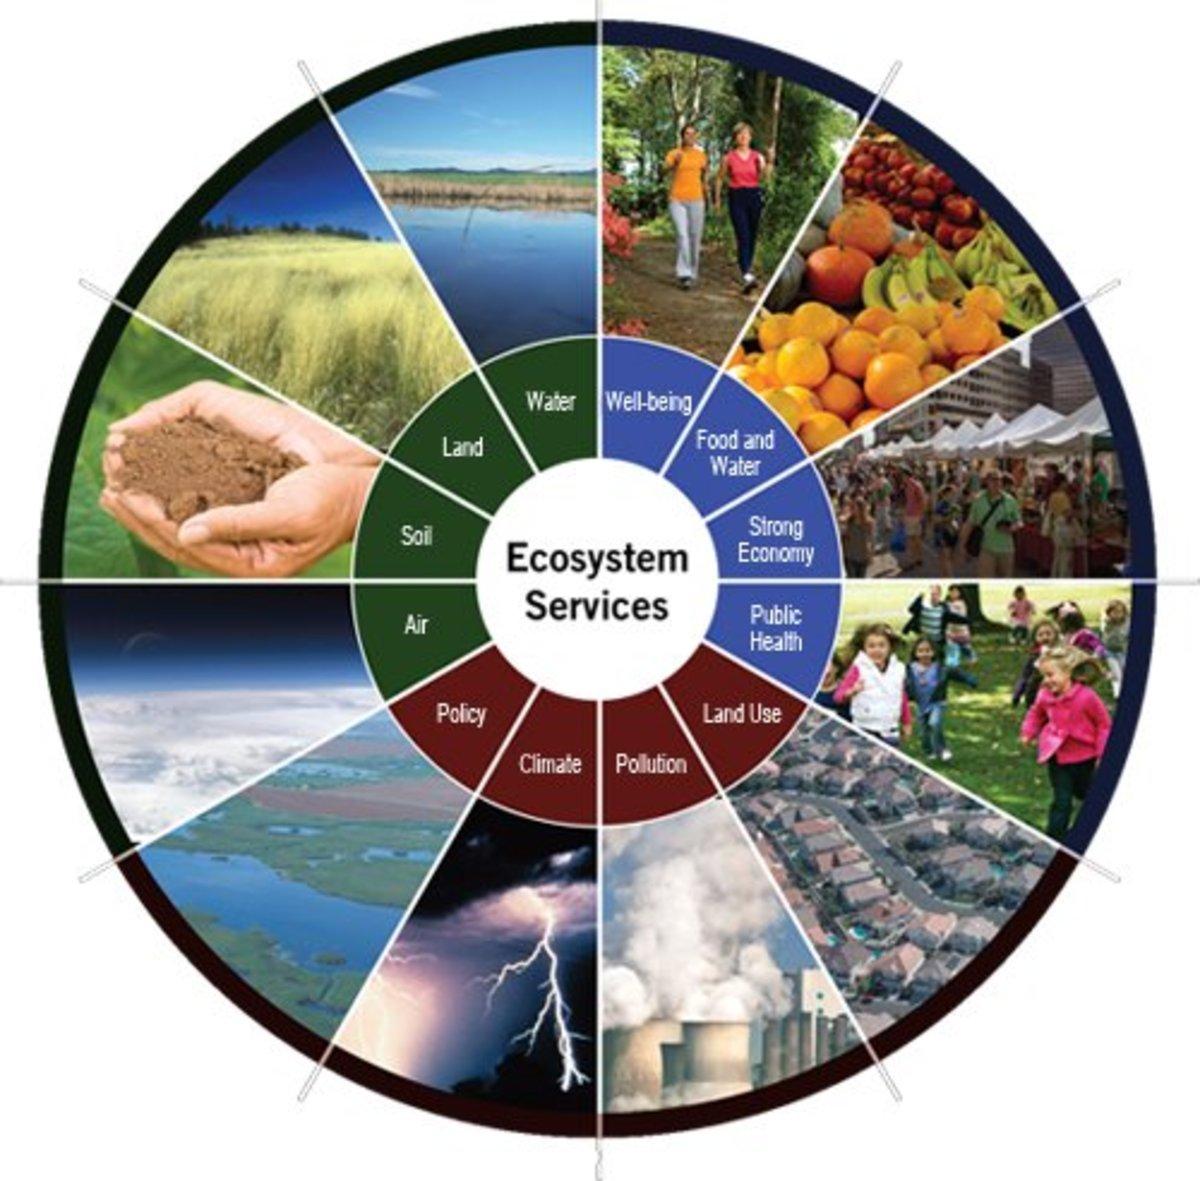 ecosystem-services-economic-values